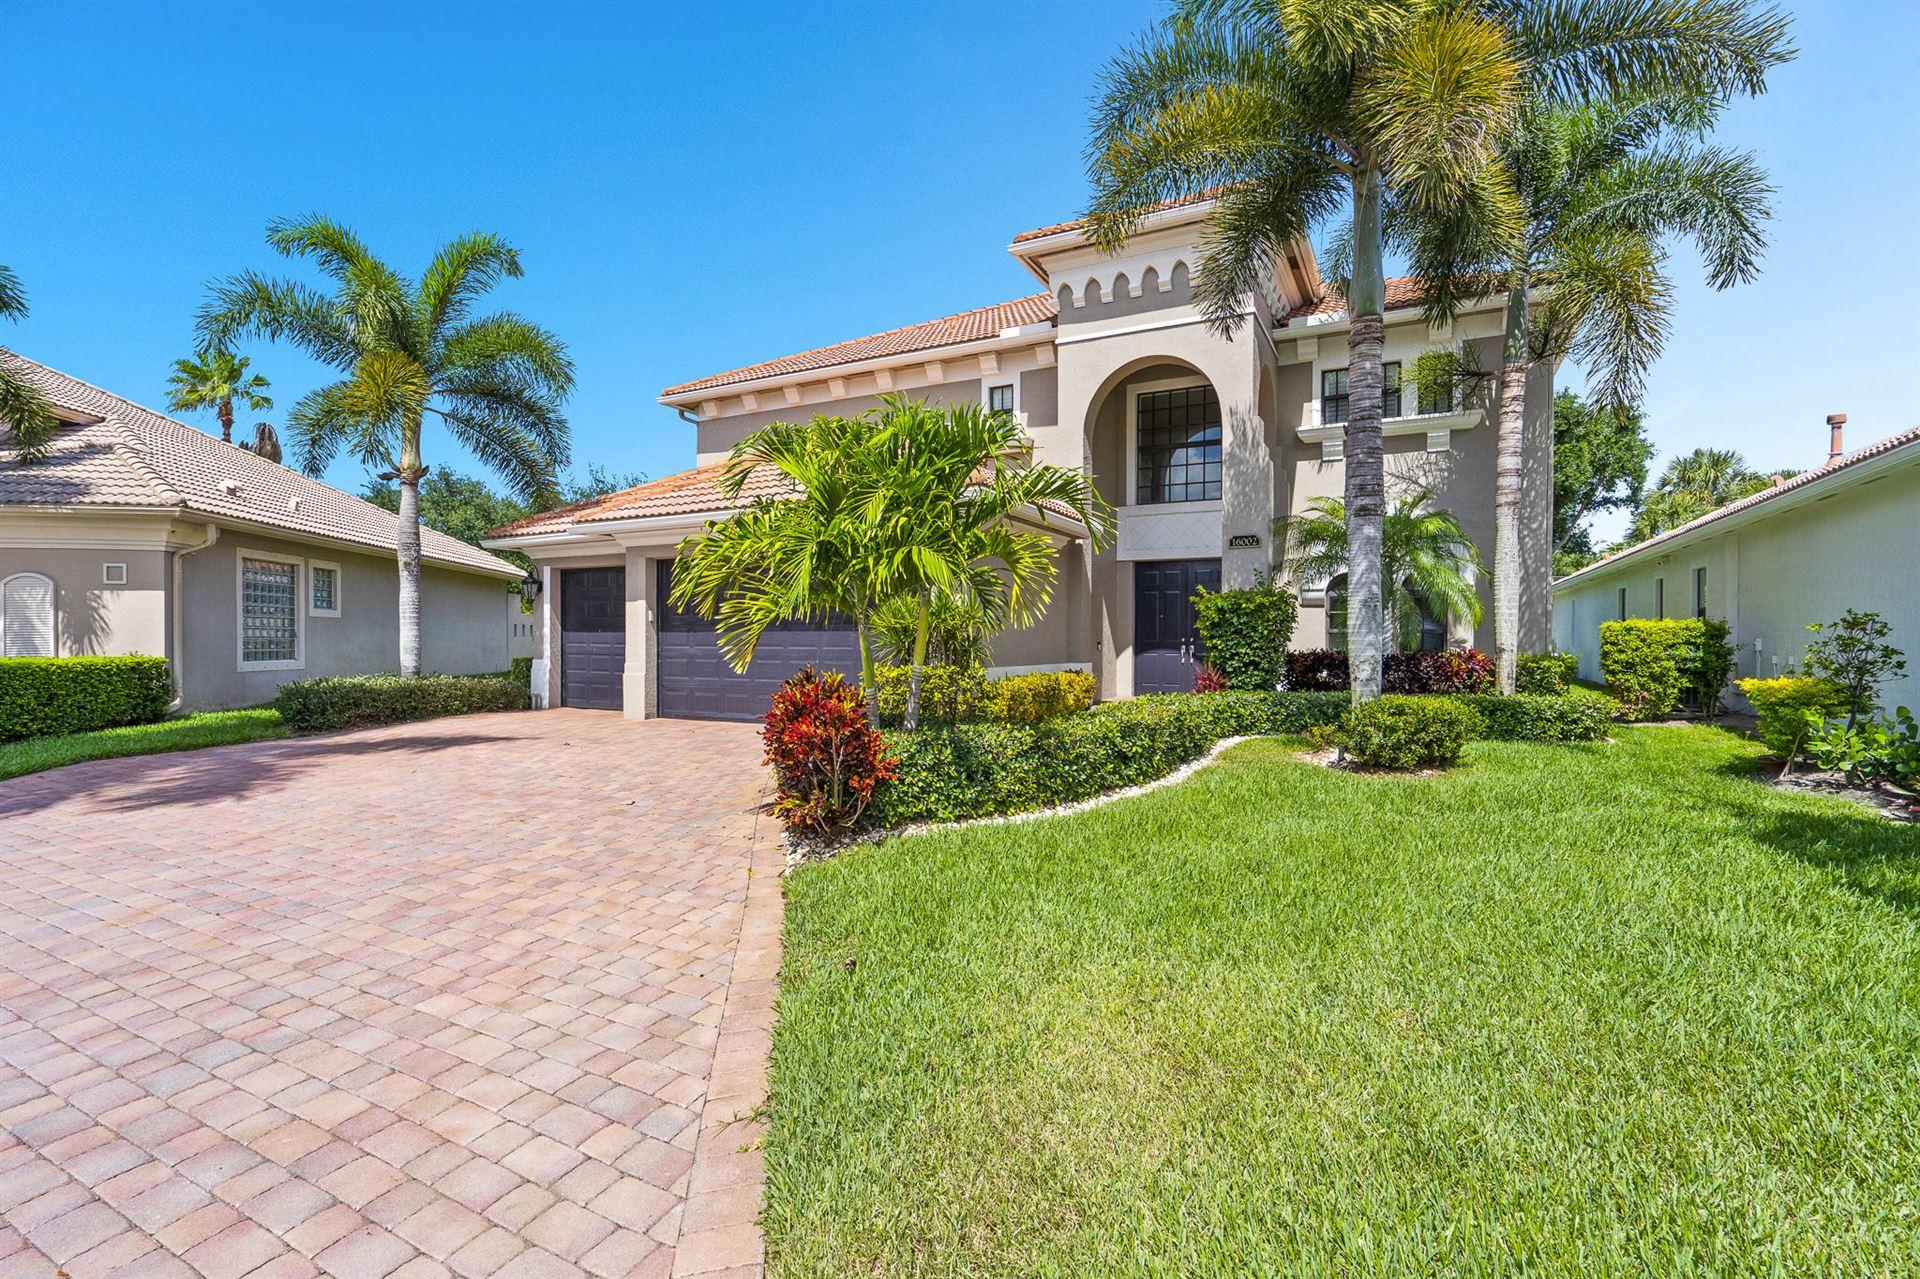 Photo of 16002 Rosecroft Terrace, Delray Beach, FL 33446 (MLS # RX-10715267)